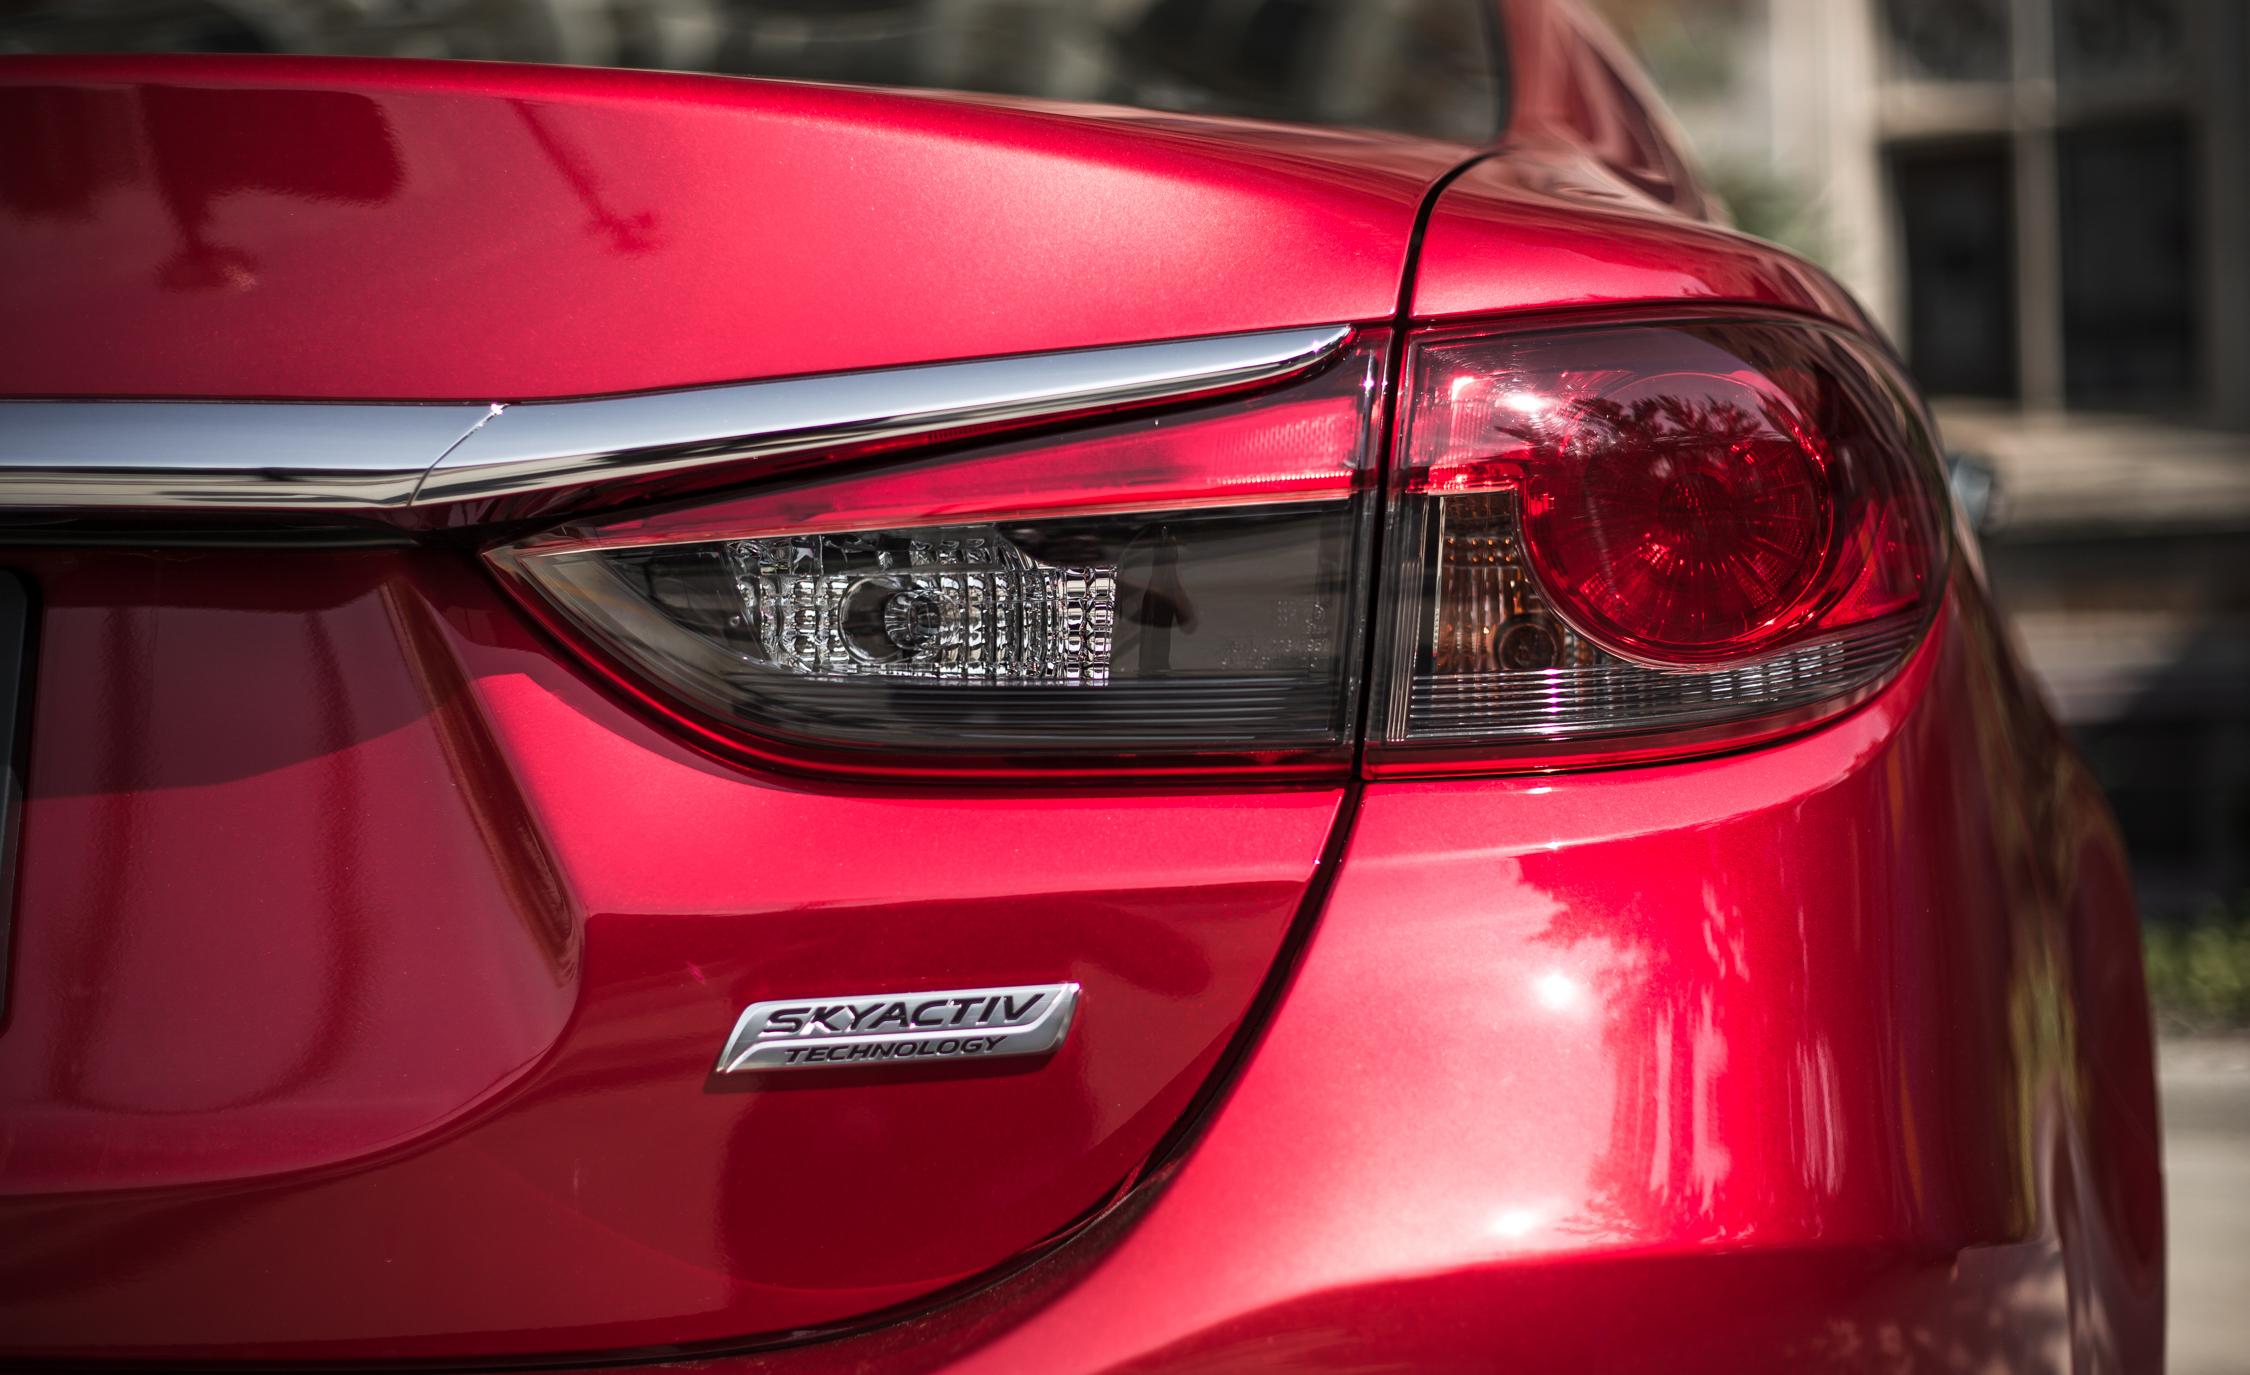 2016 Mazda 6 Touring Exterior Right Taillight